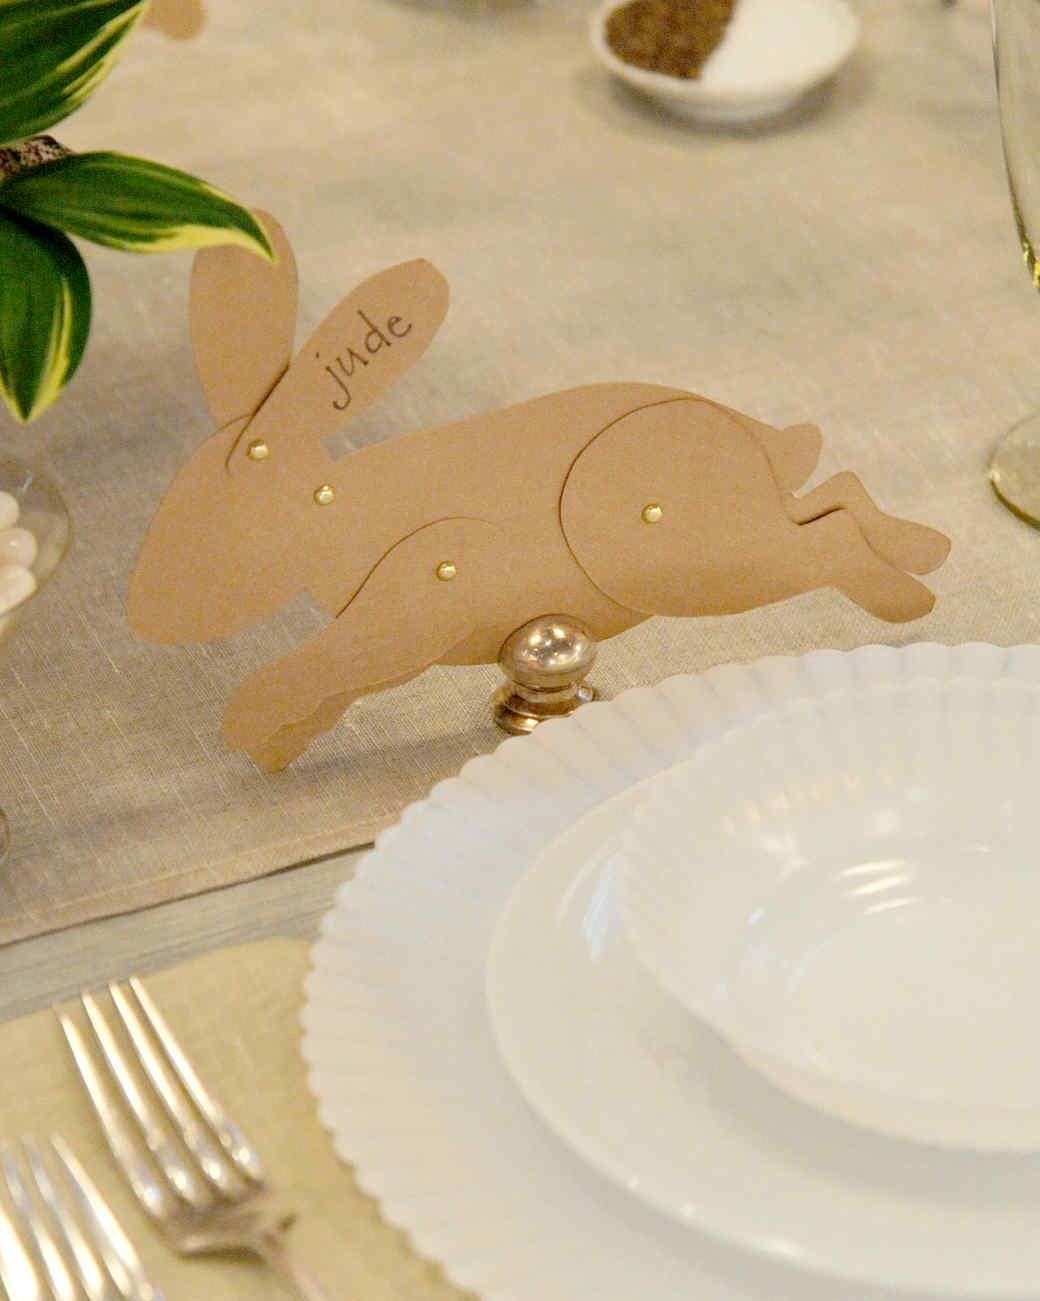 Bunny Place Card